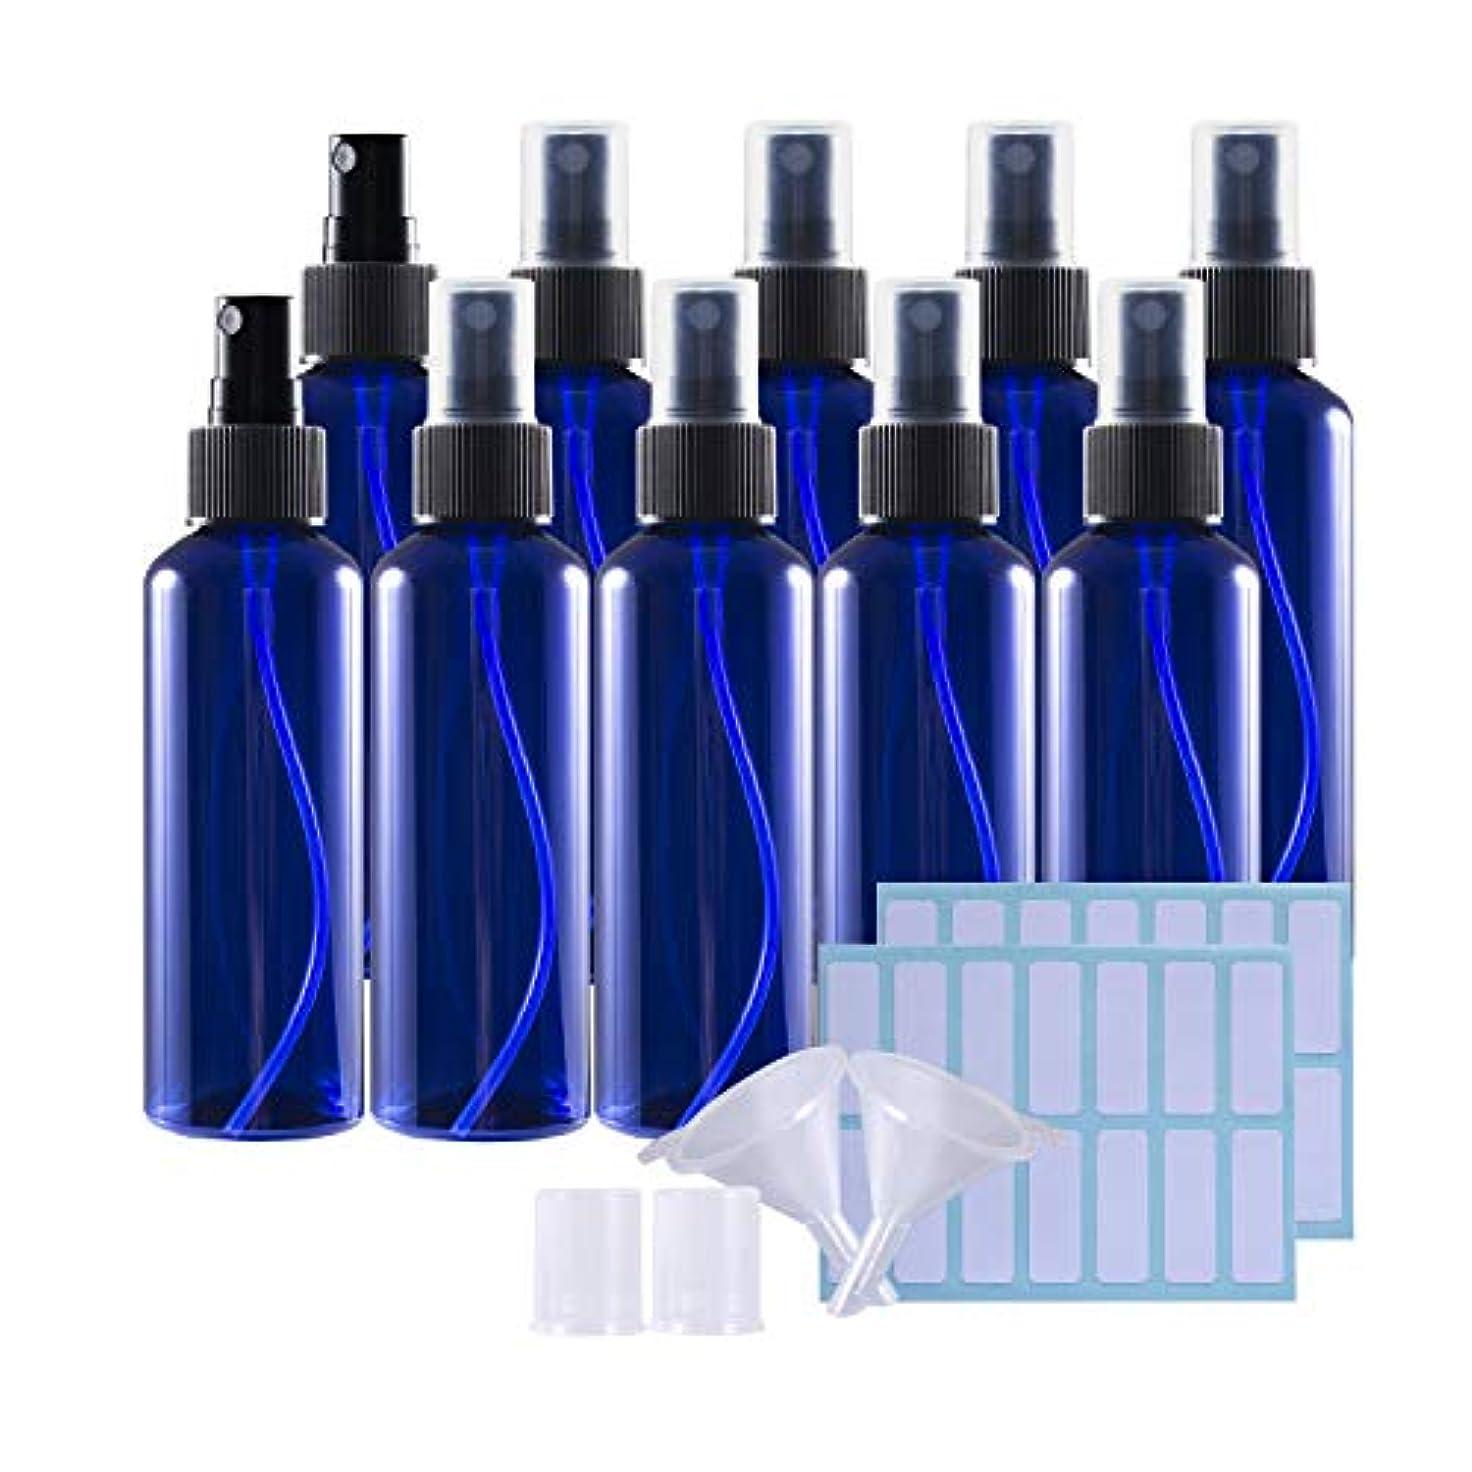 100mlスプレーボトル 10個セット遮光瓶 小分けボトル プラスチック容器 液体用空ボトル 押し式詰替用ボトル 詰め替え シャンプー クリーム 化粧品 収納瓶